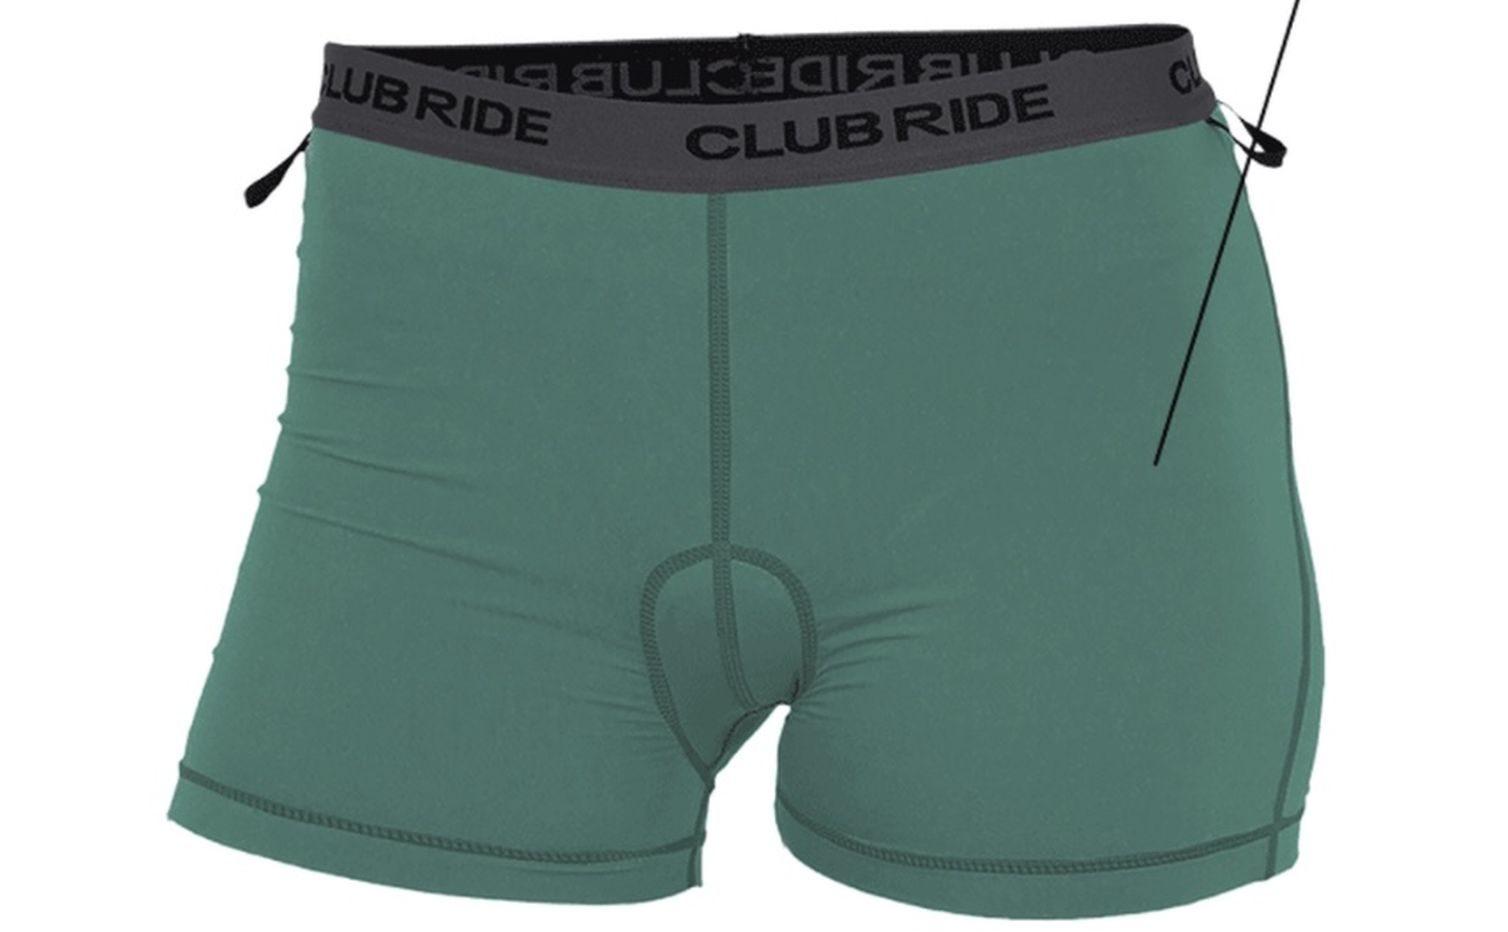 club ride june shorts best back to school bike accessories